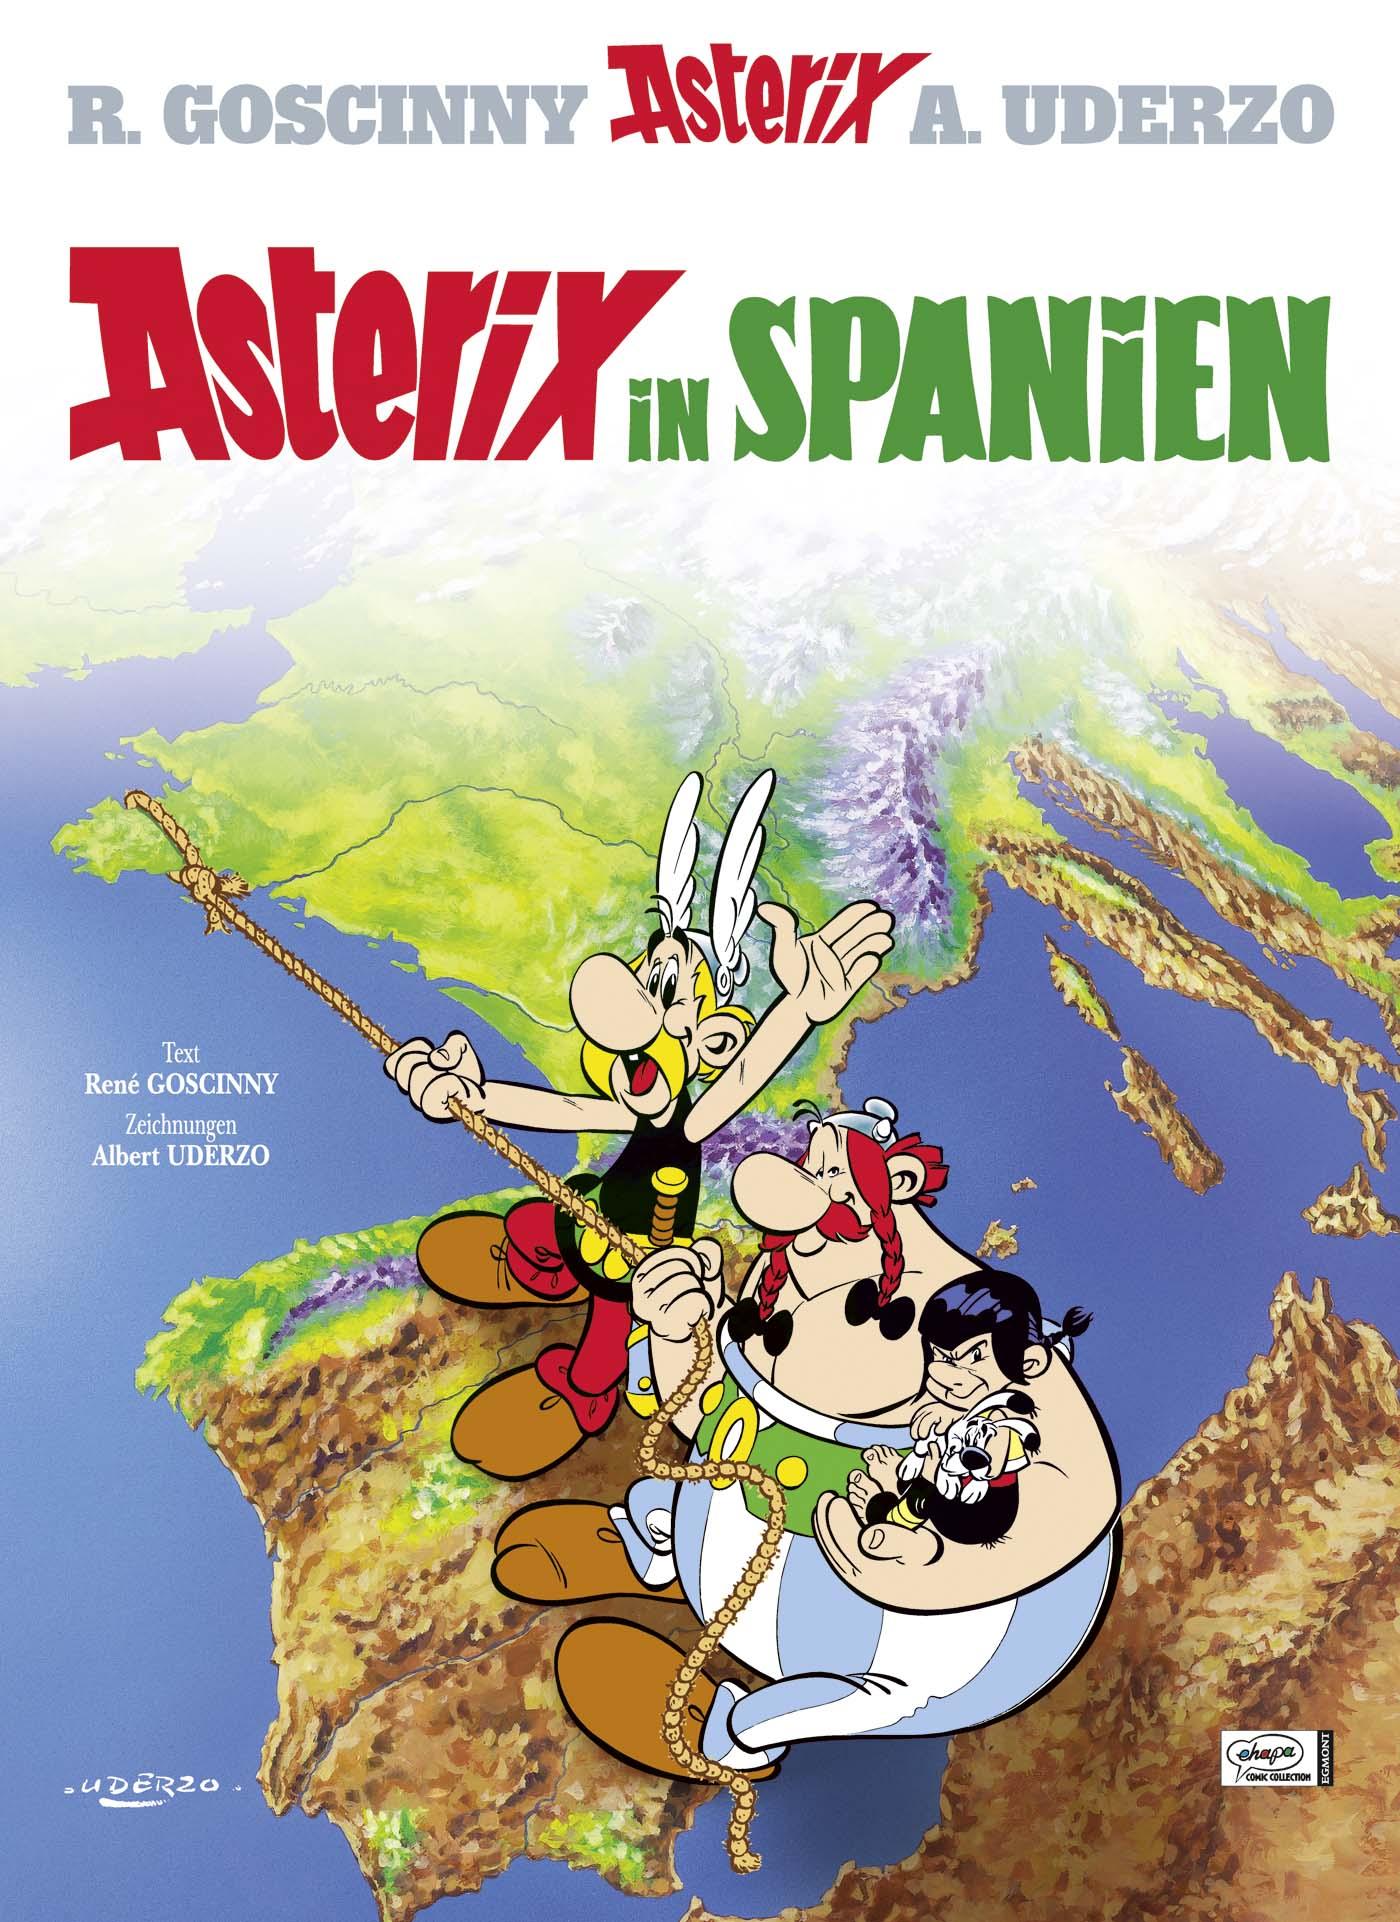 Asterix: Band 14 - Asterix in Spanien - Rene Goscinny & Albert Uderzo [Gebundene Ausgabe]